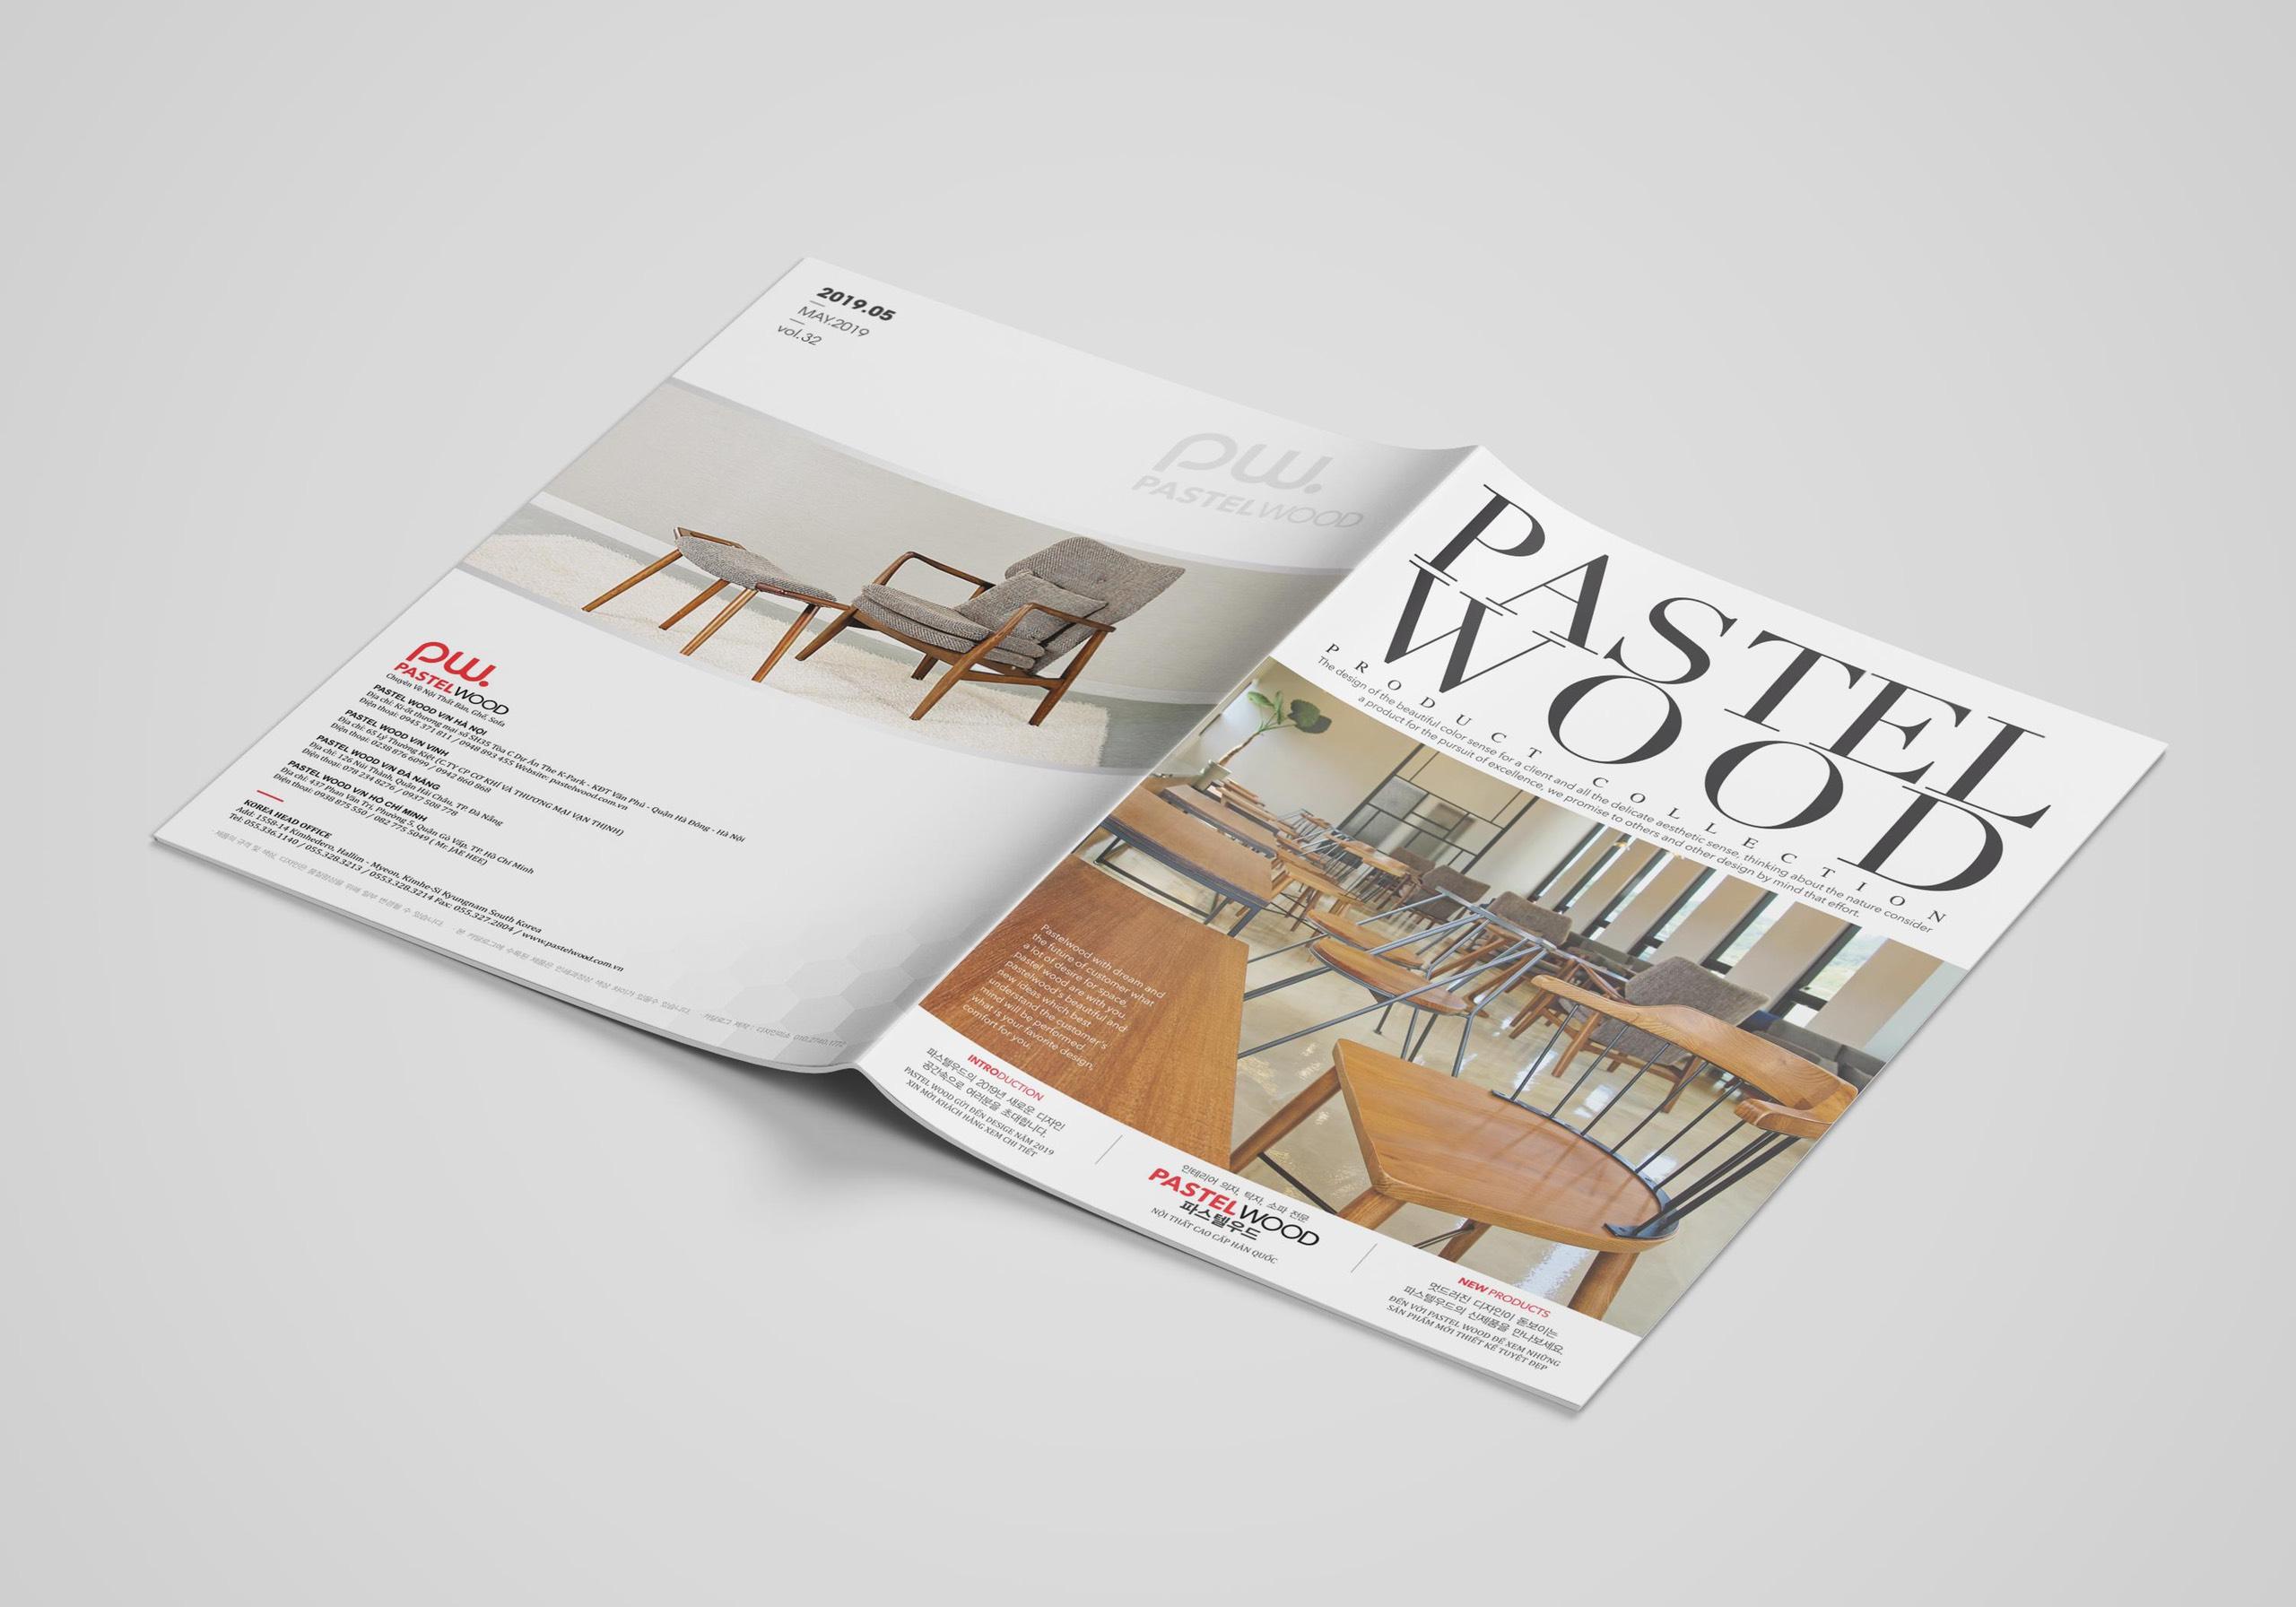 thiết kế catalogue rubic group 5